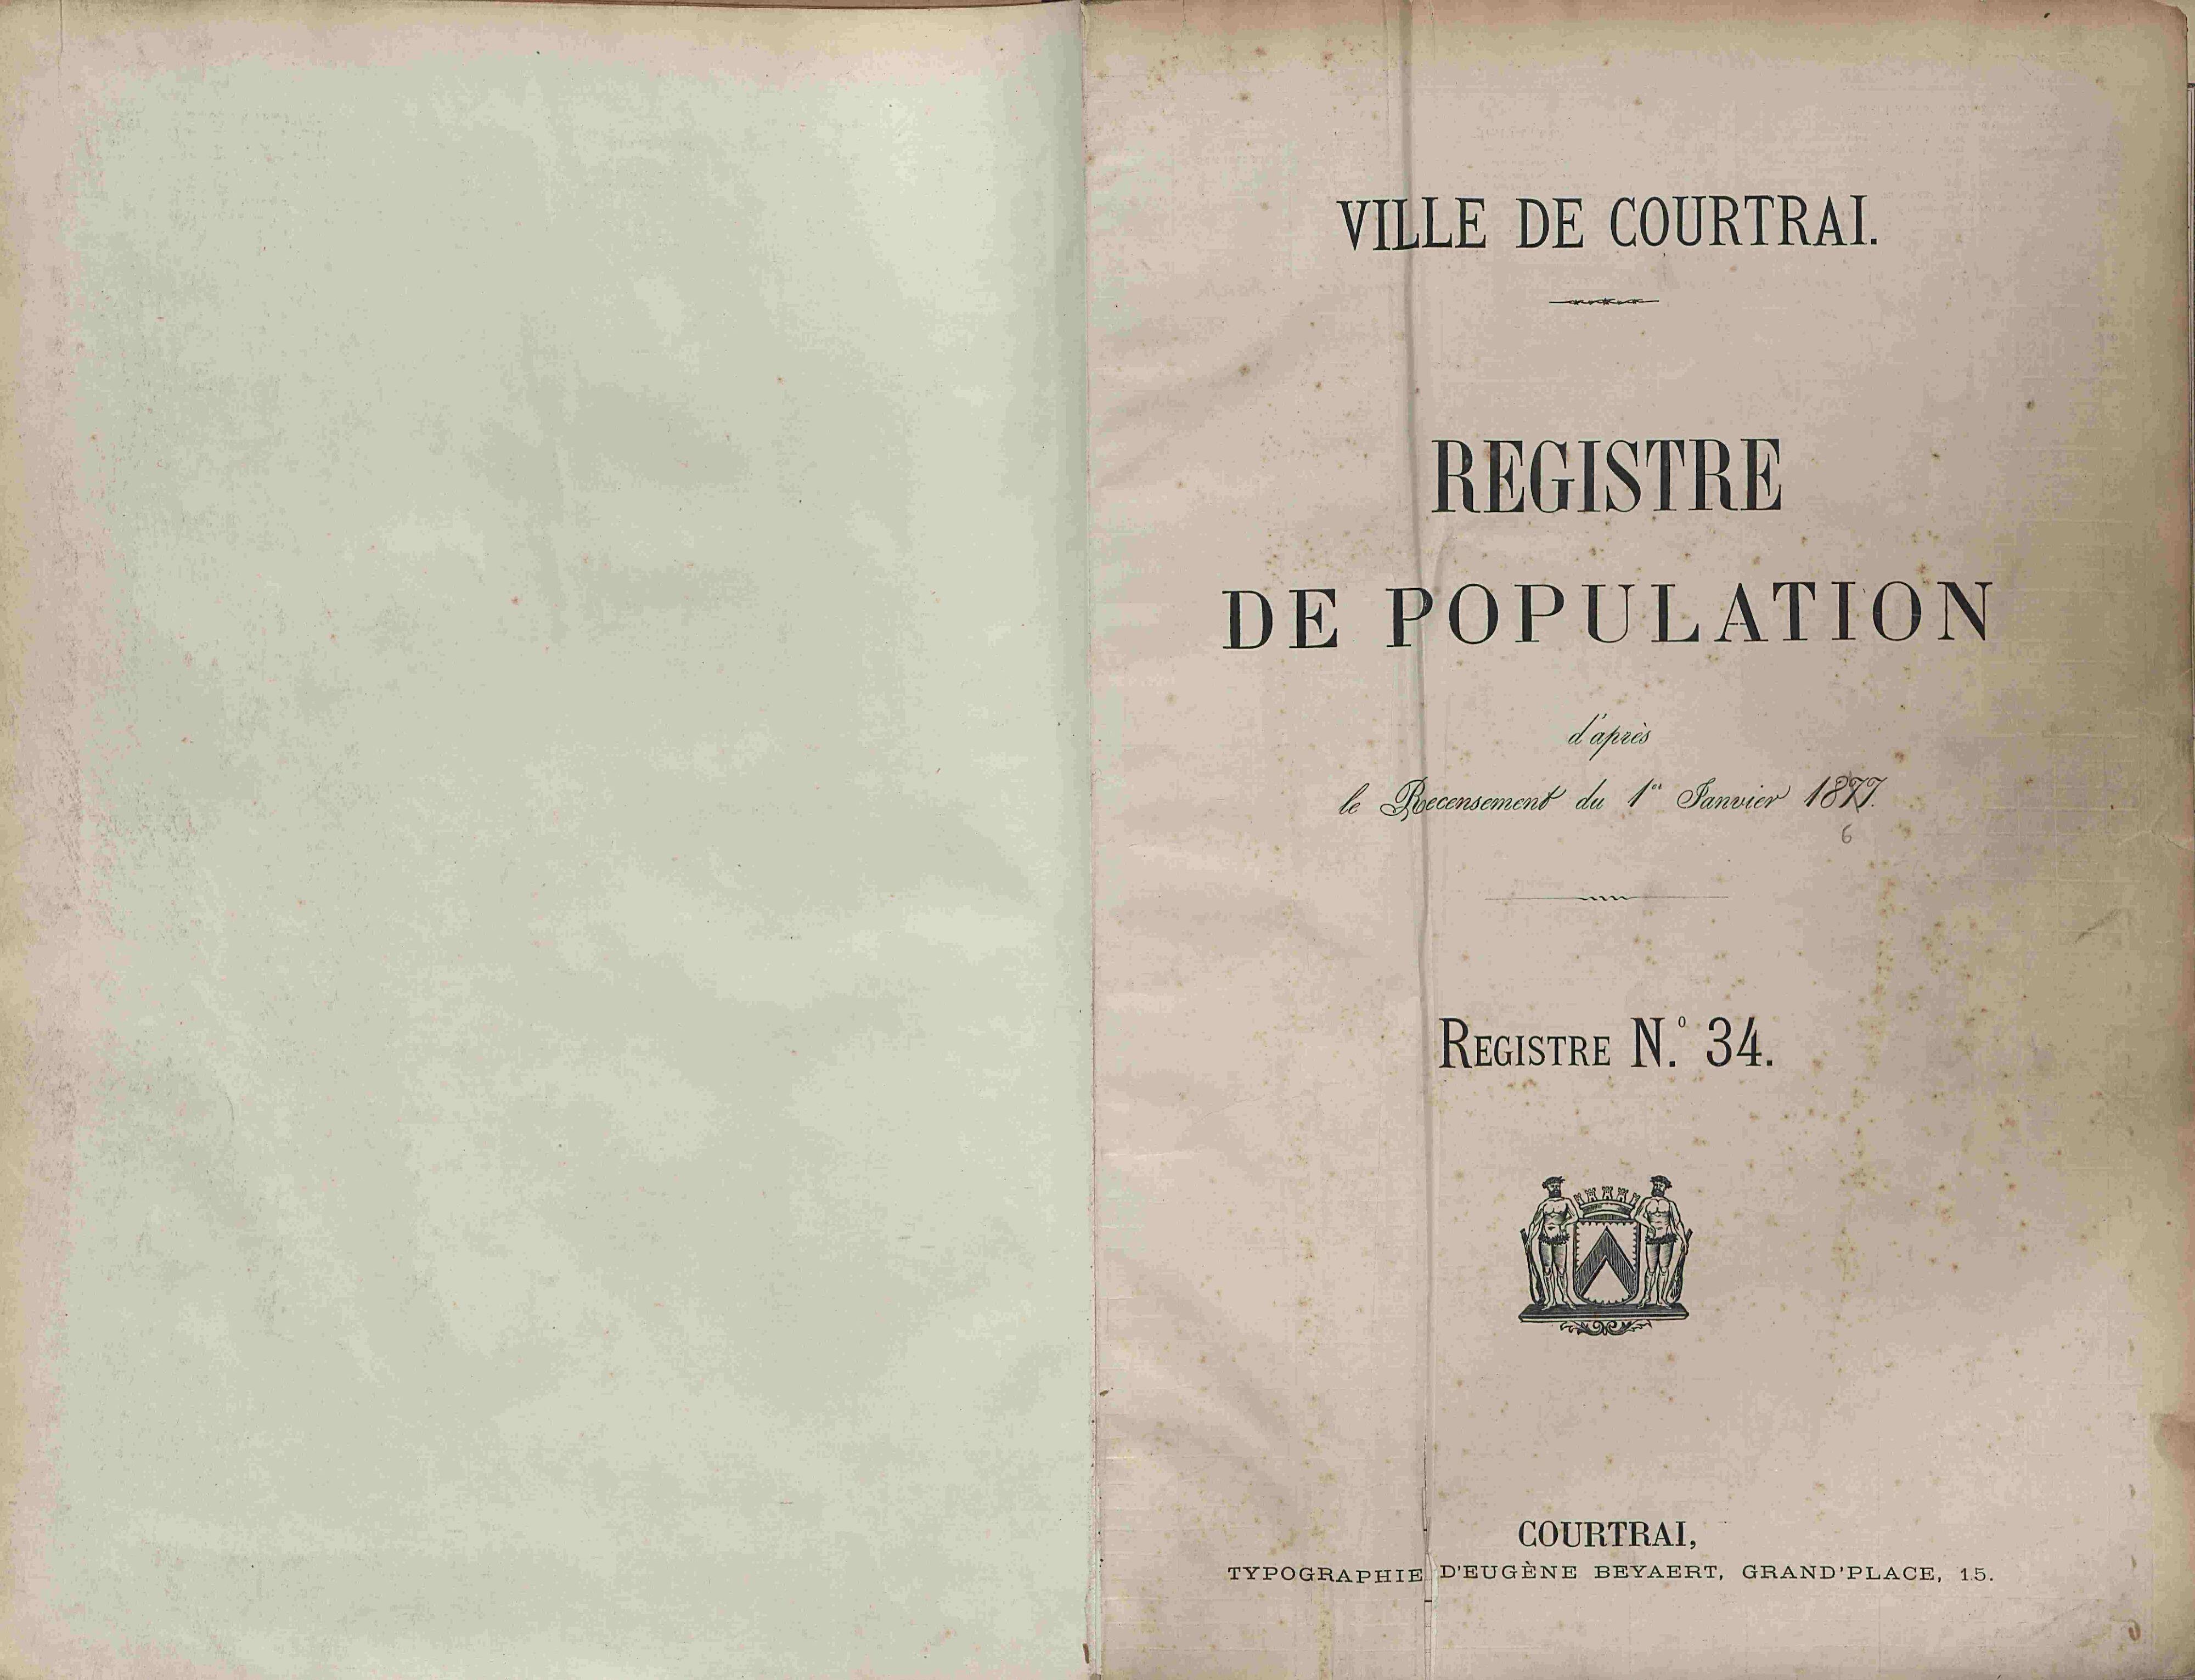 Bevolkingsregister Kortrijk 1866 boek 34